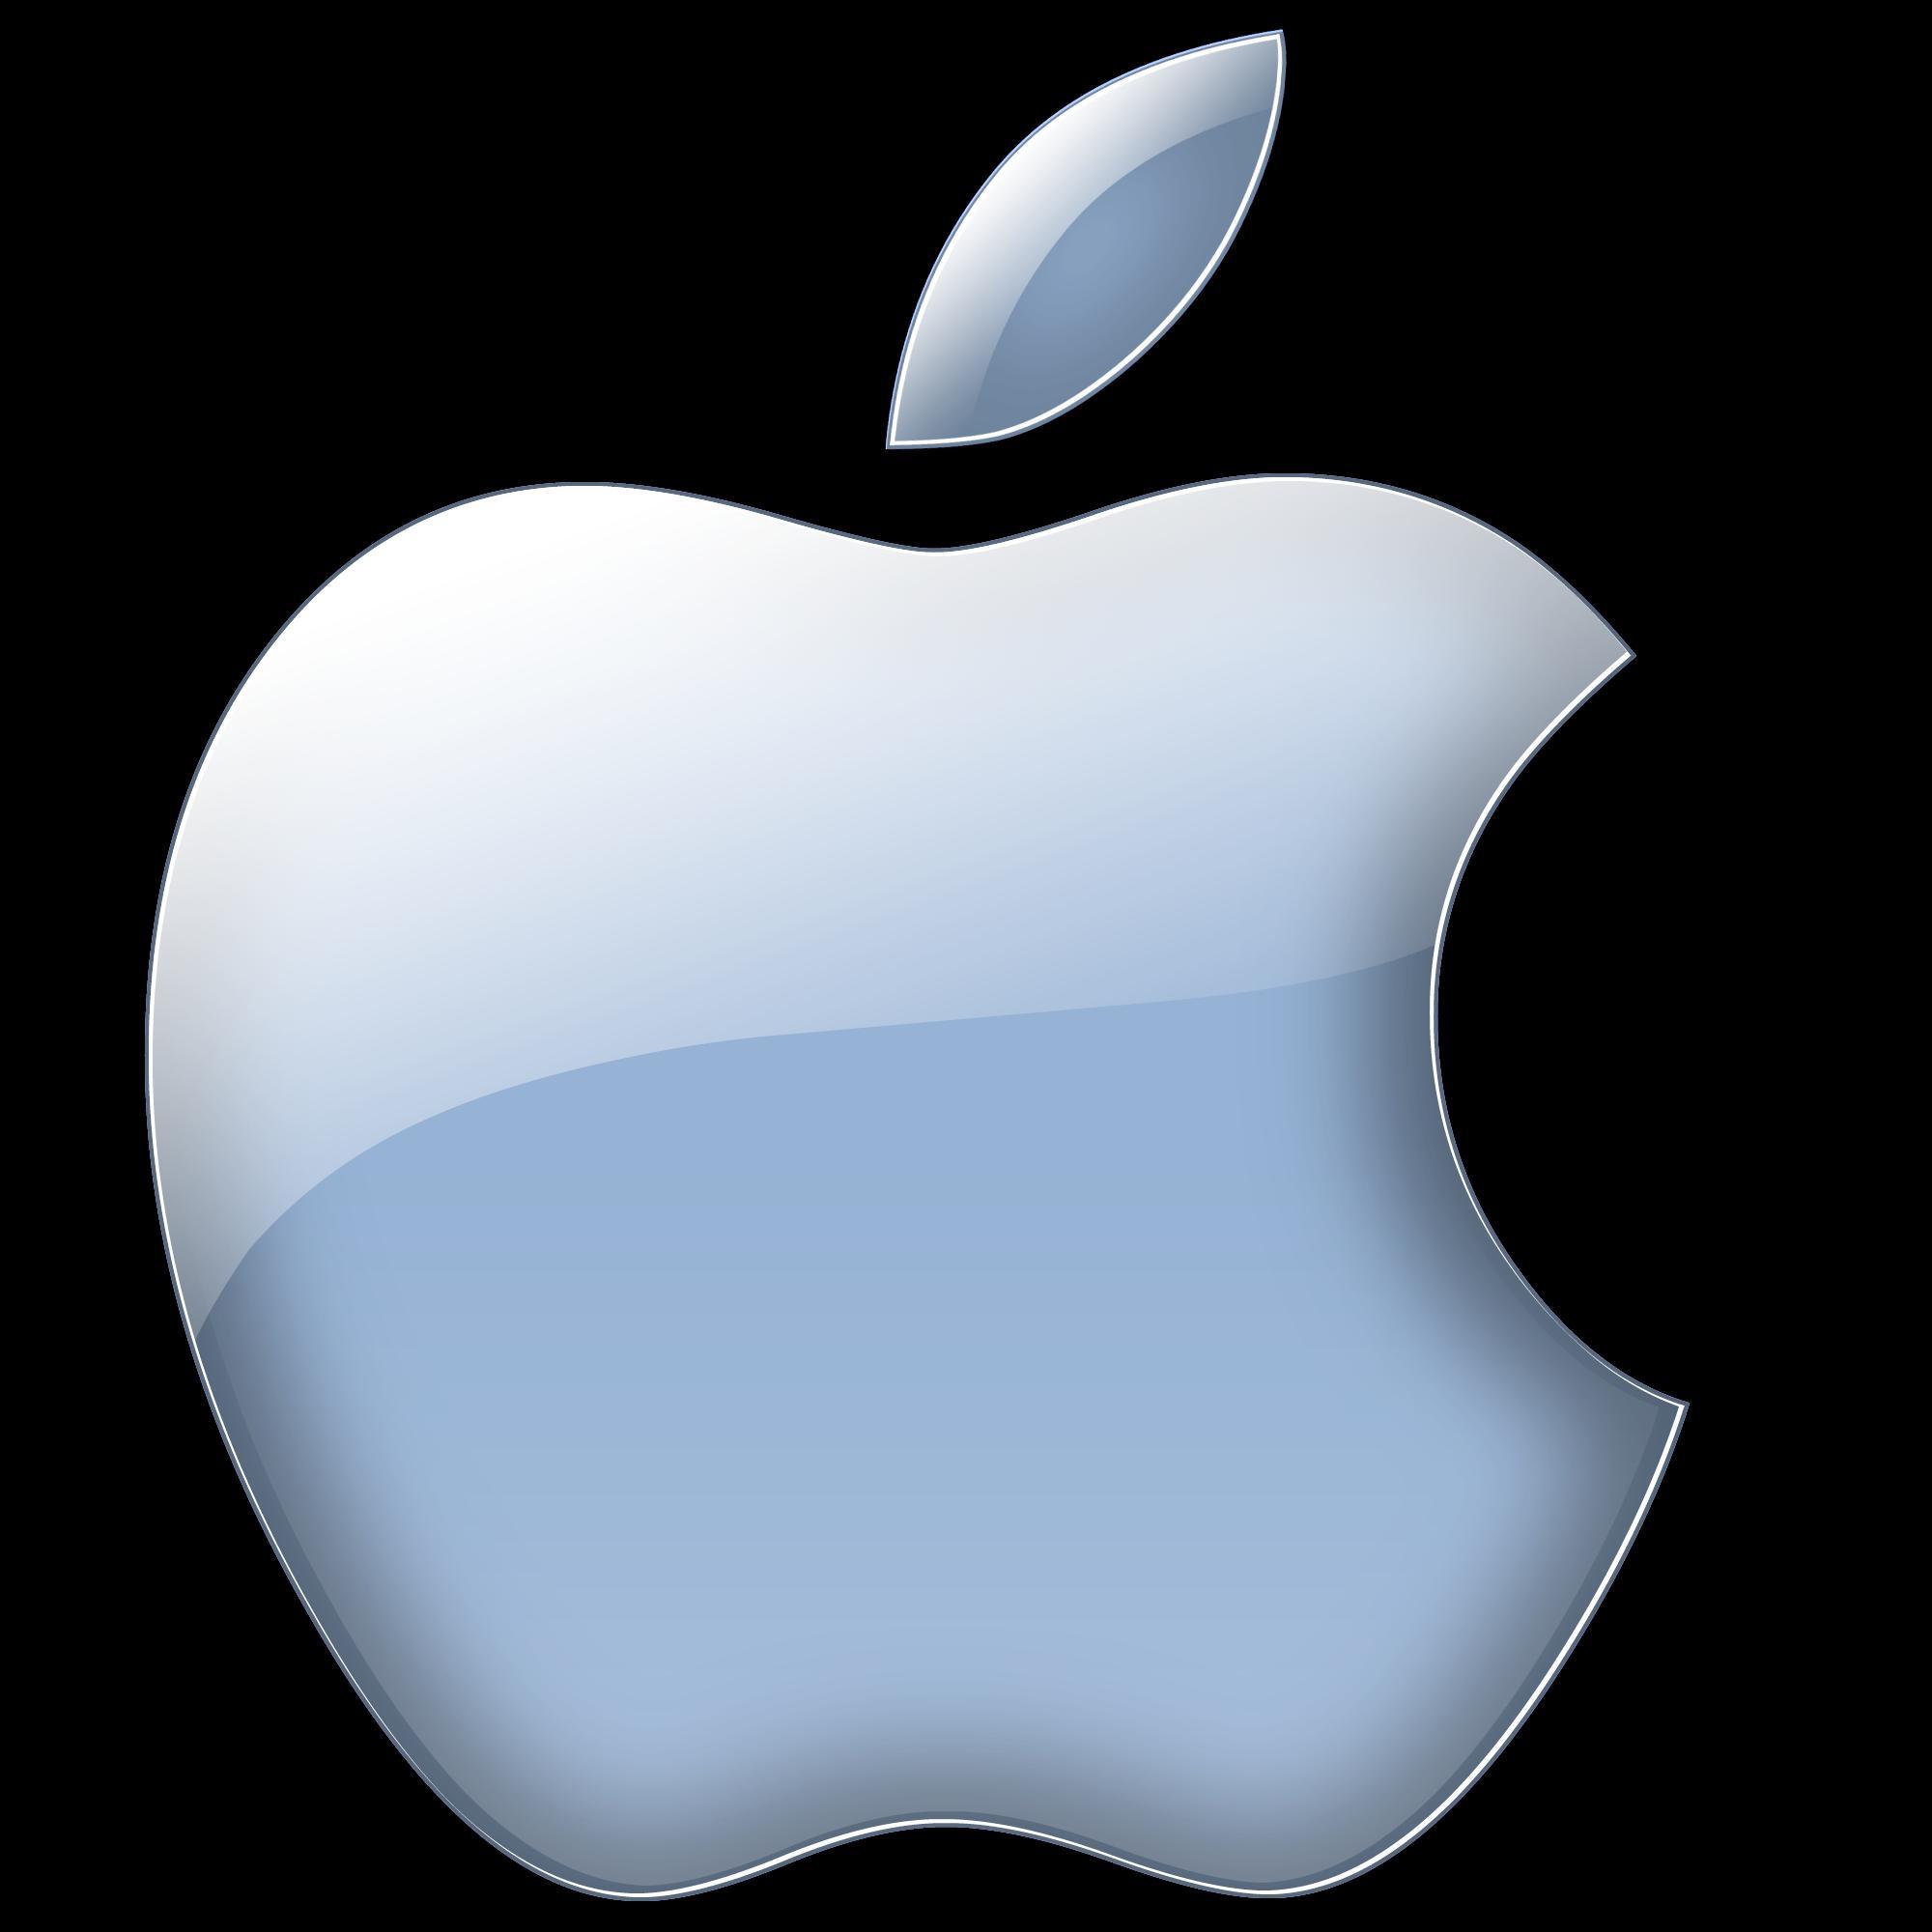 Official apple logo